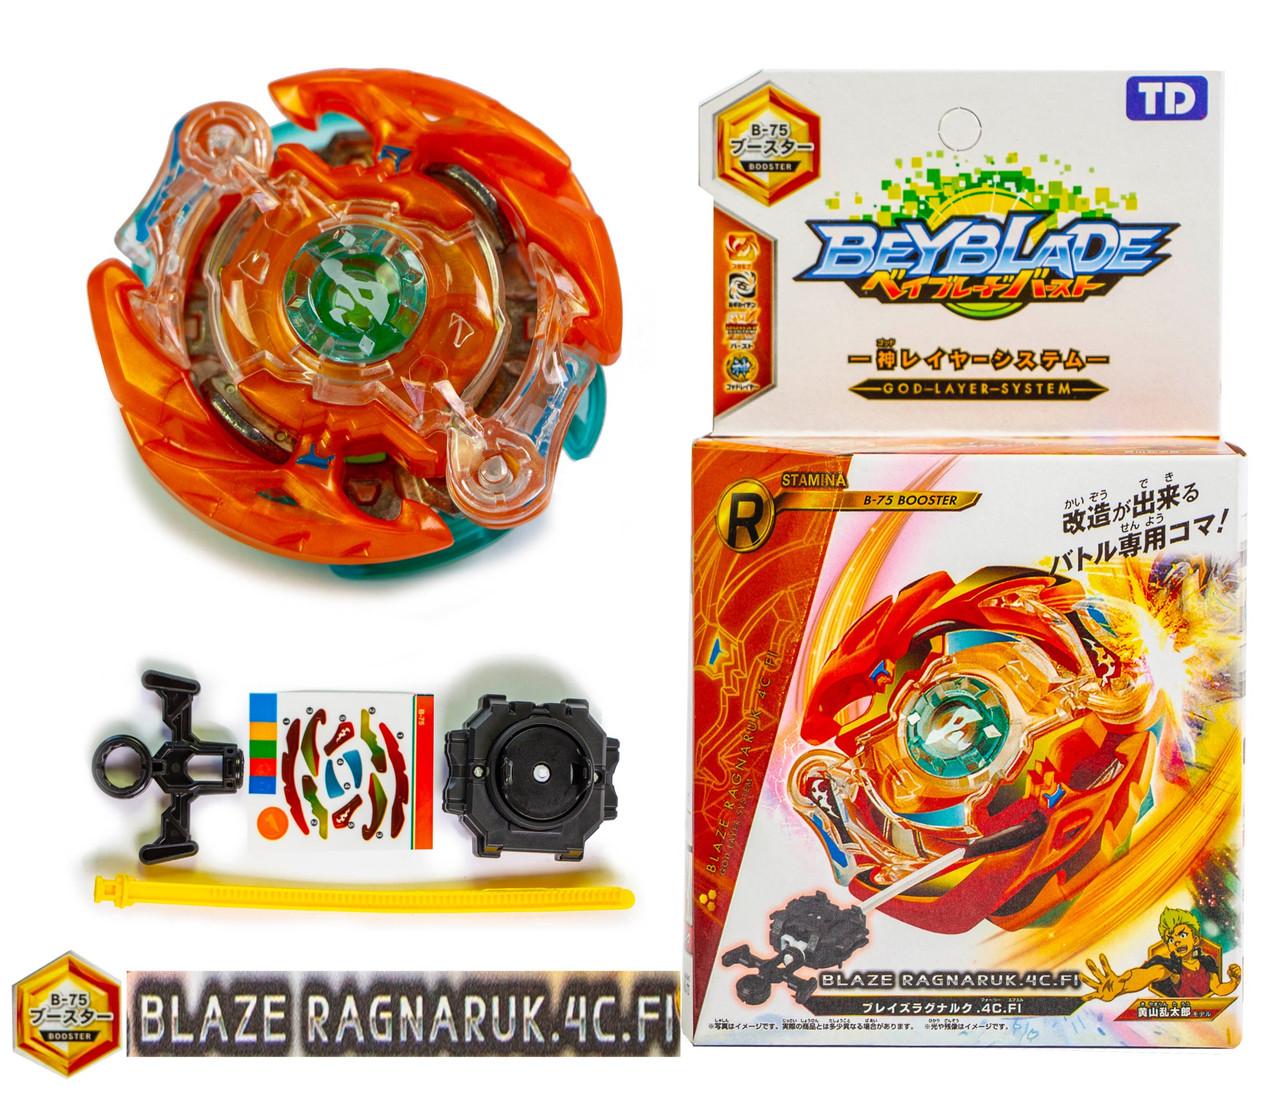 Волчок Ракнарук BeyBlade Blaze Ragnaruk B-75